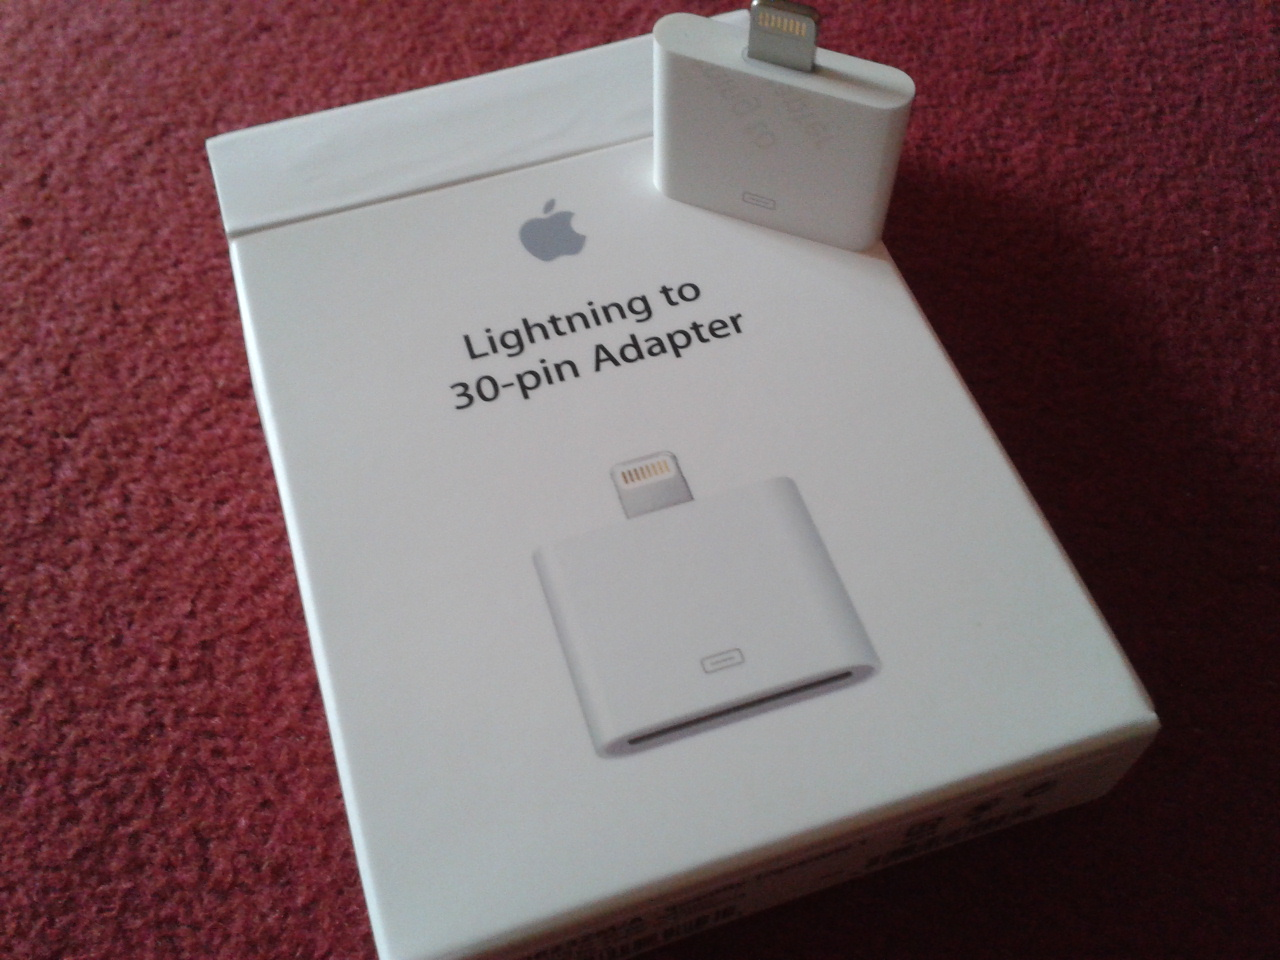 Apple Lightning Adaptor on Box